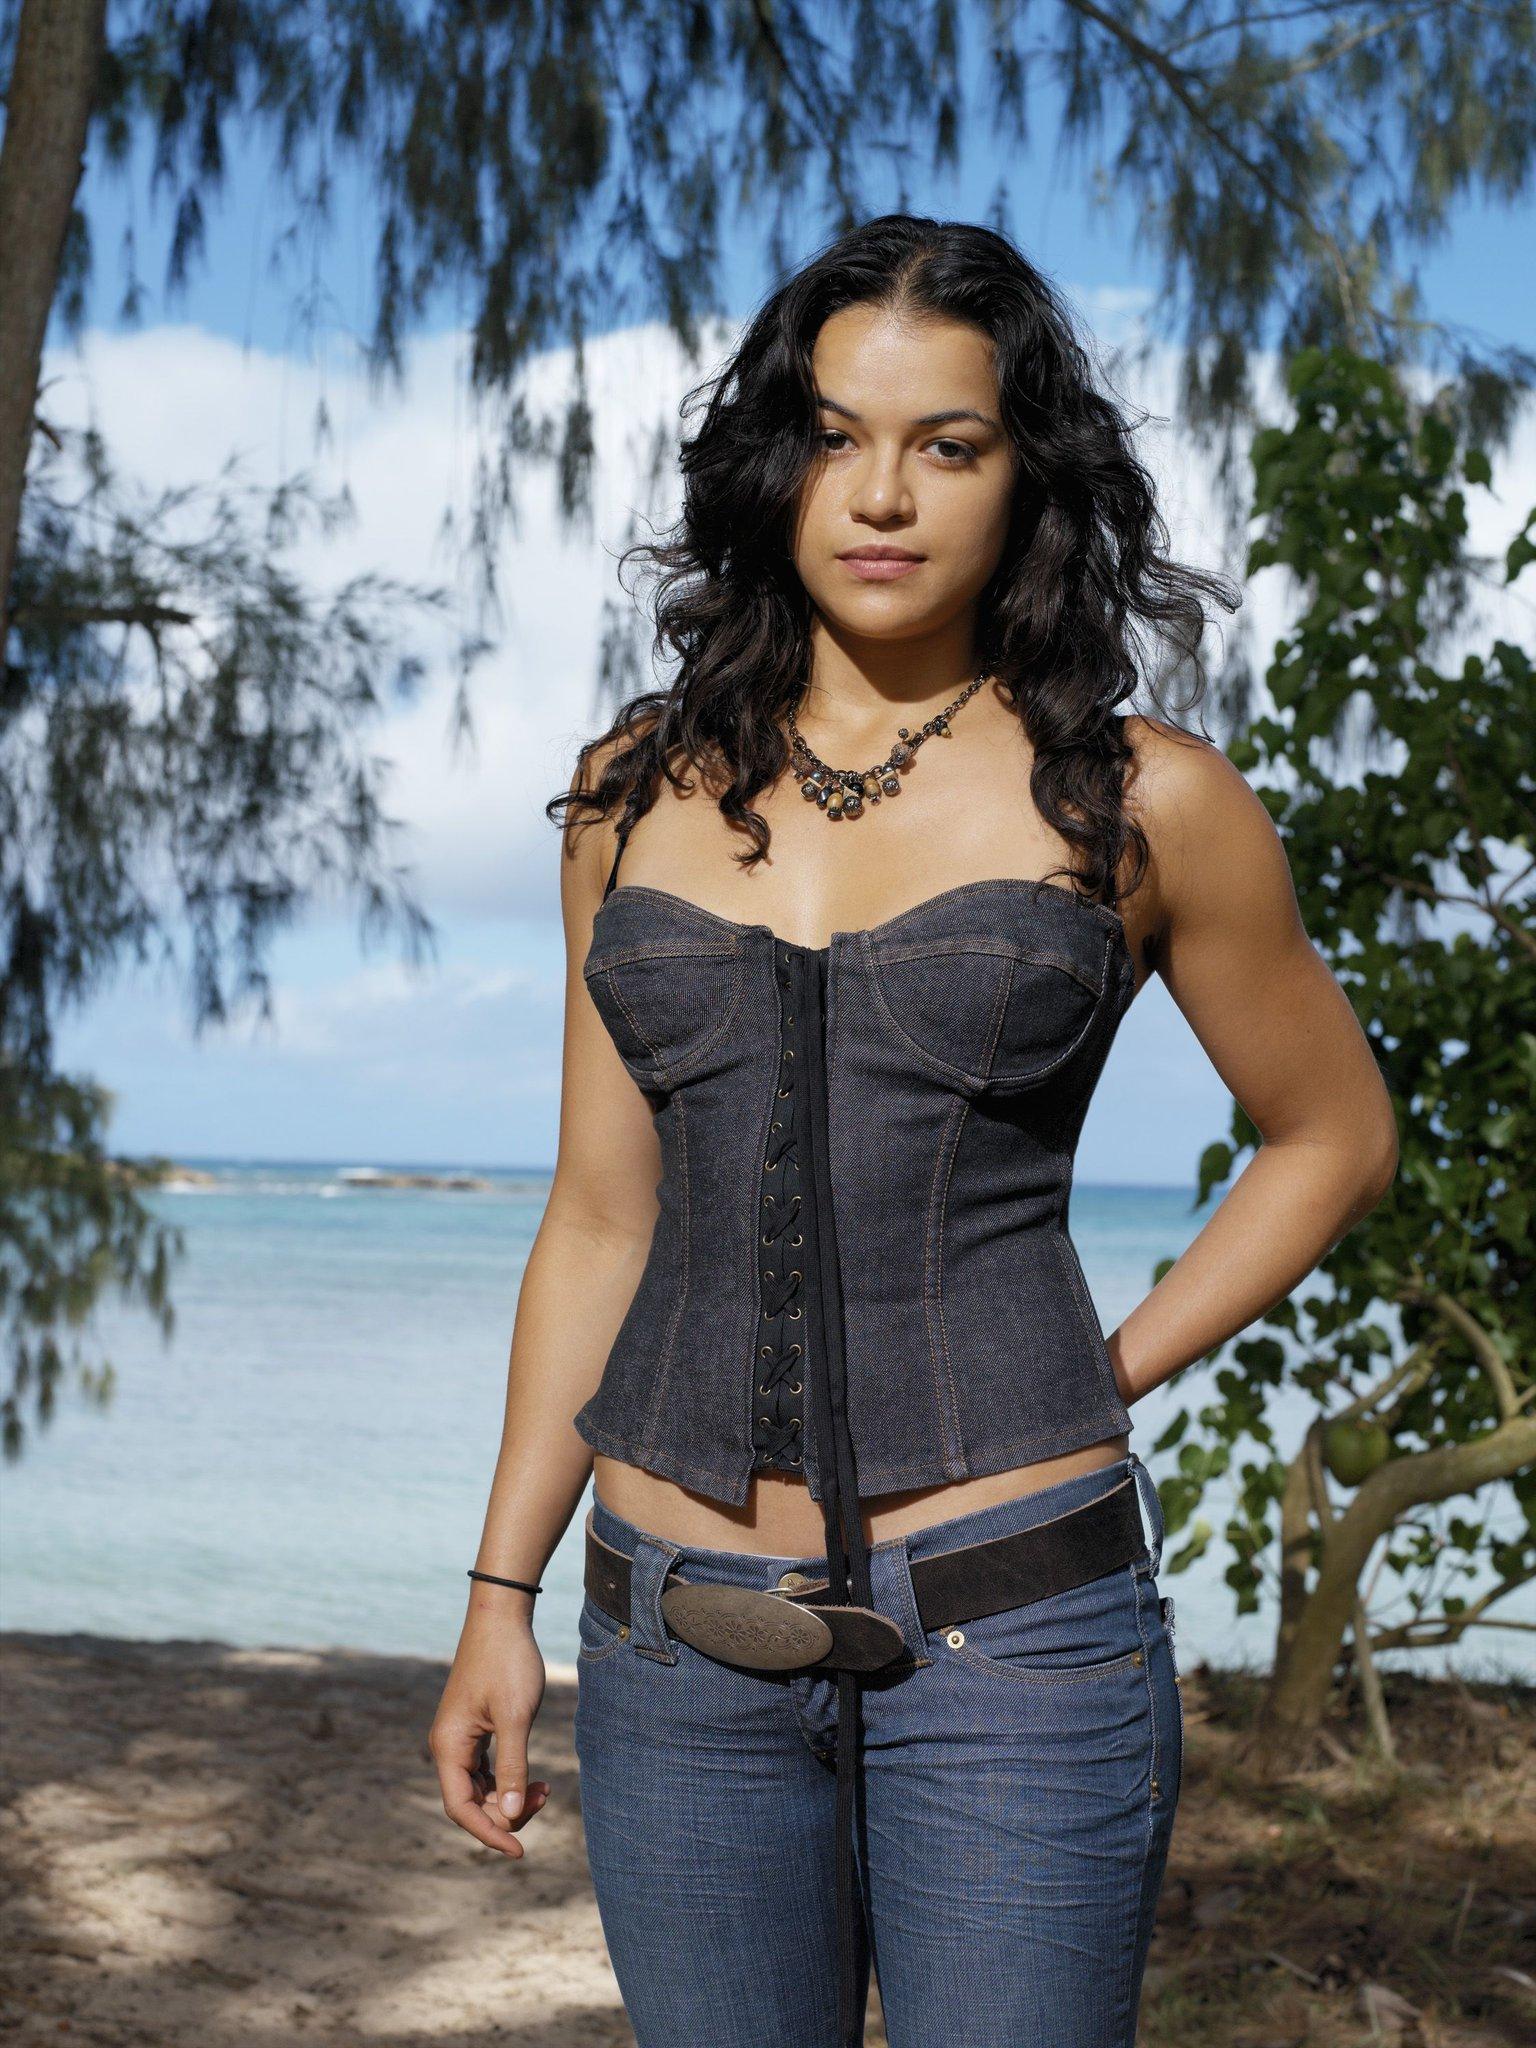 Happy Birthday to Michelle Rodriguez!